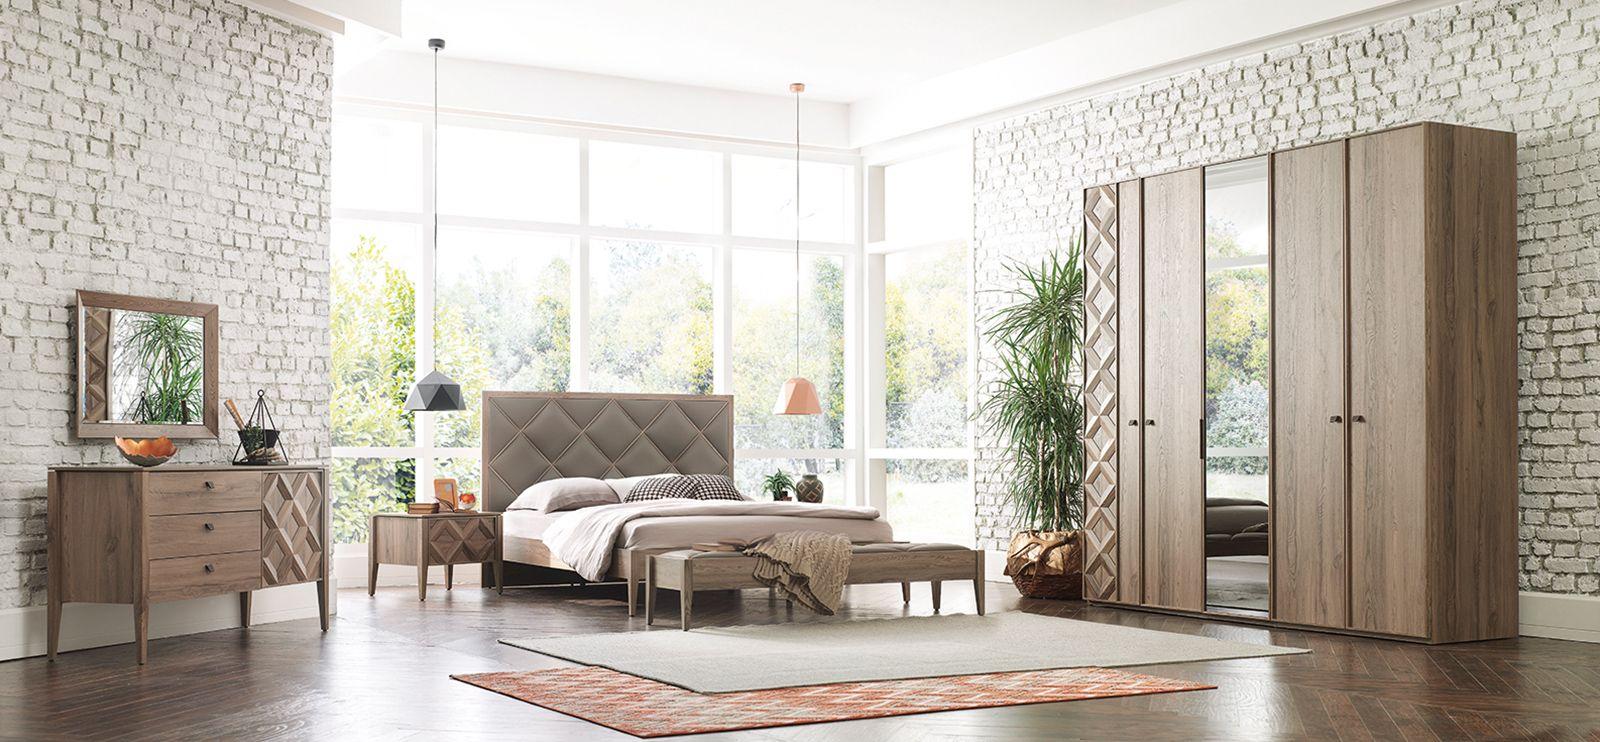 Enza Home Schlafzimmer Modelle 2019 ,